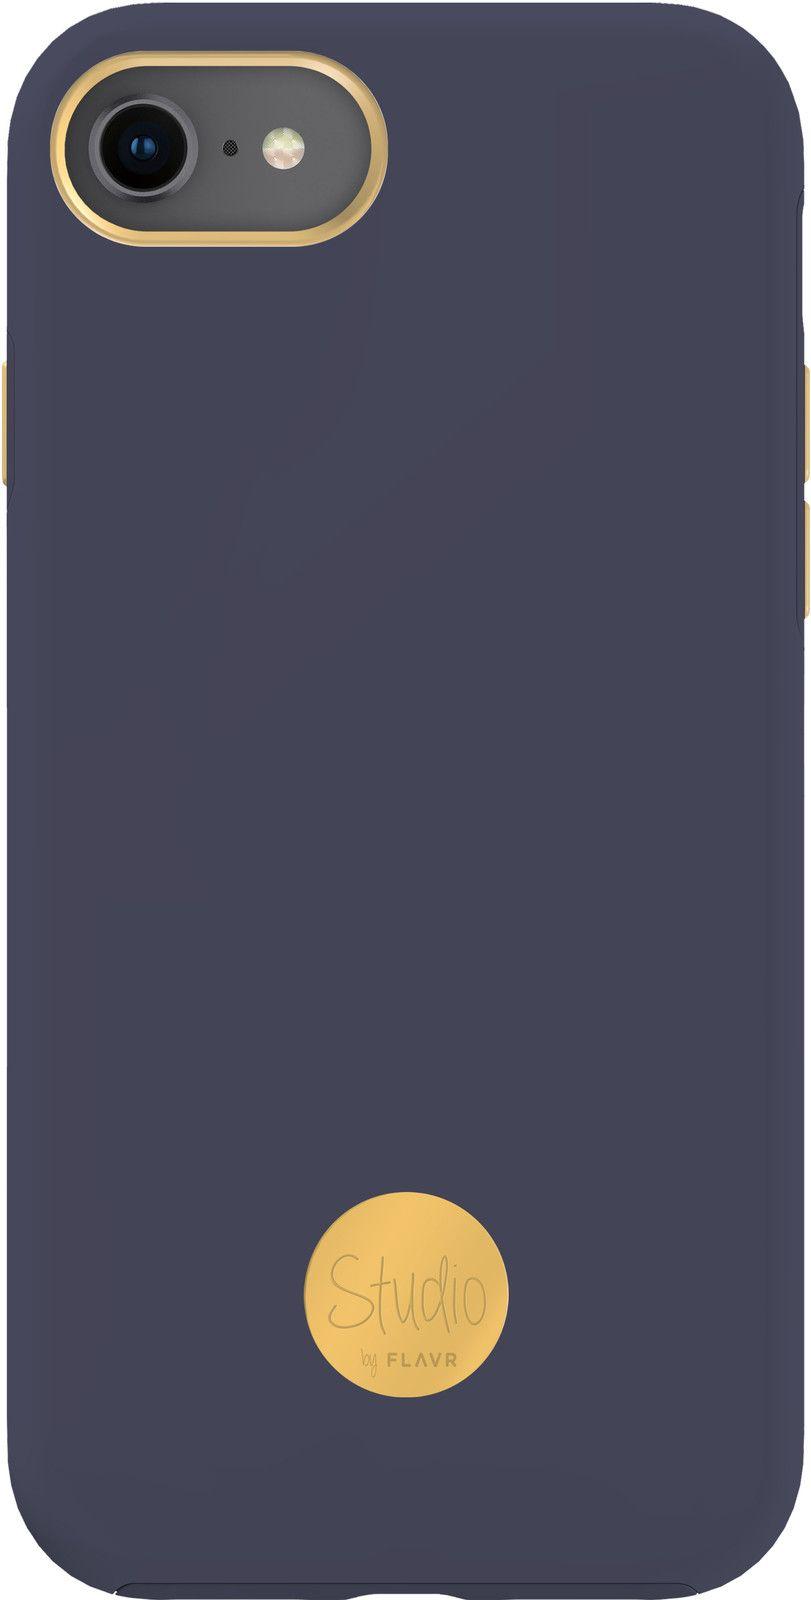 Flavr Studio Pure (Phone 8/7/6/6S) - Blå